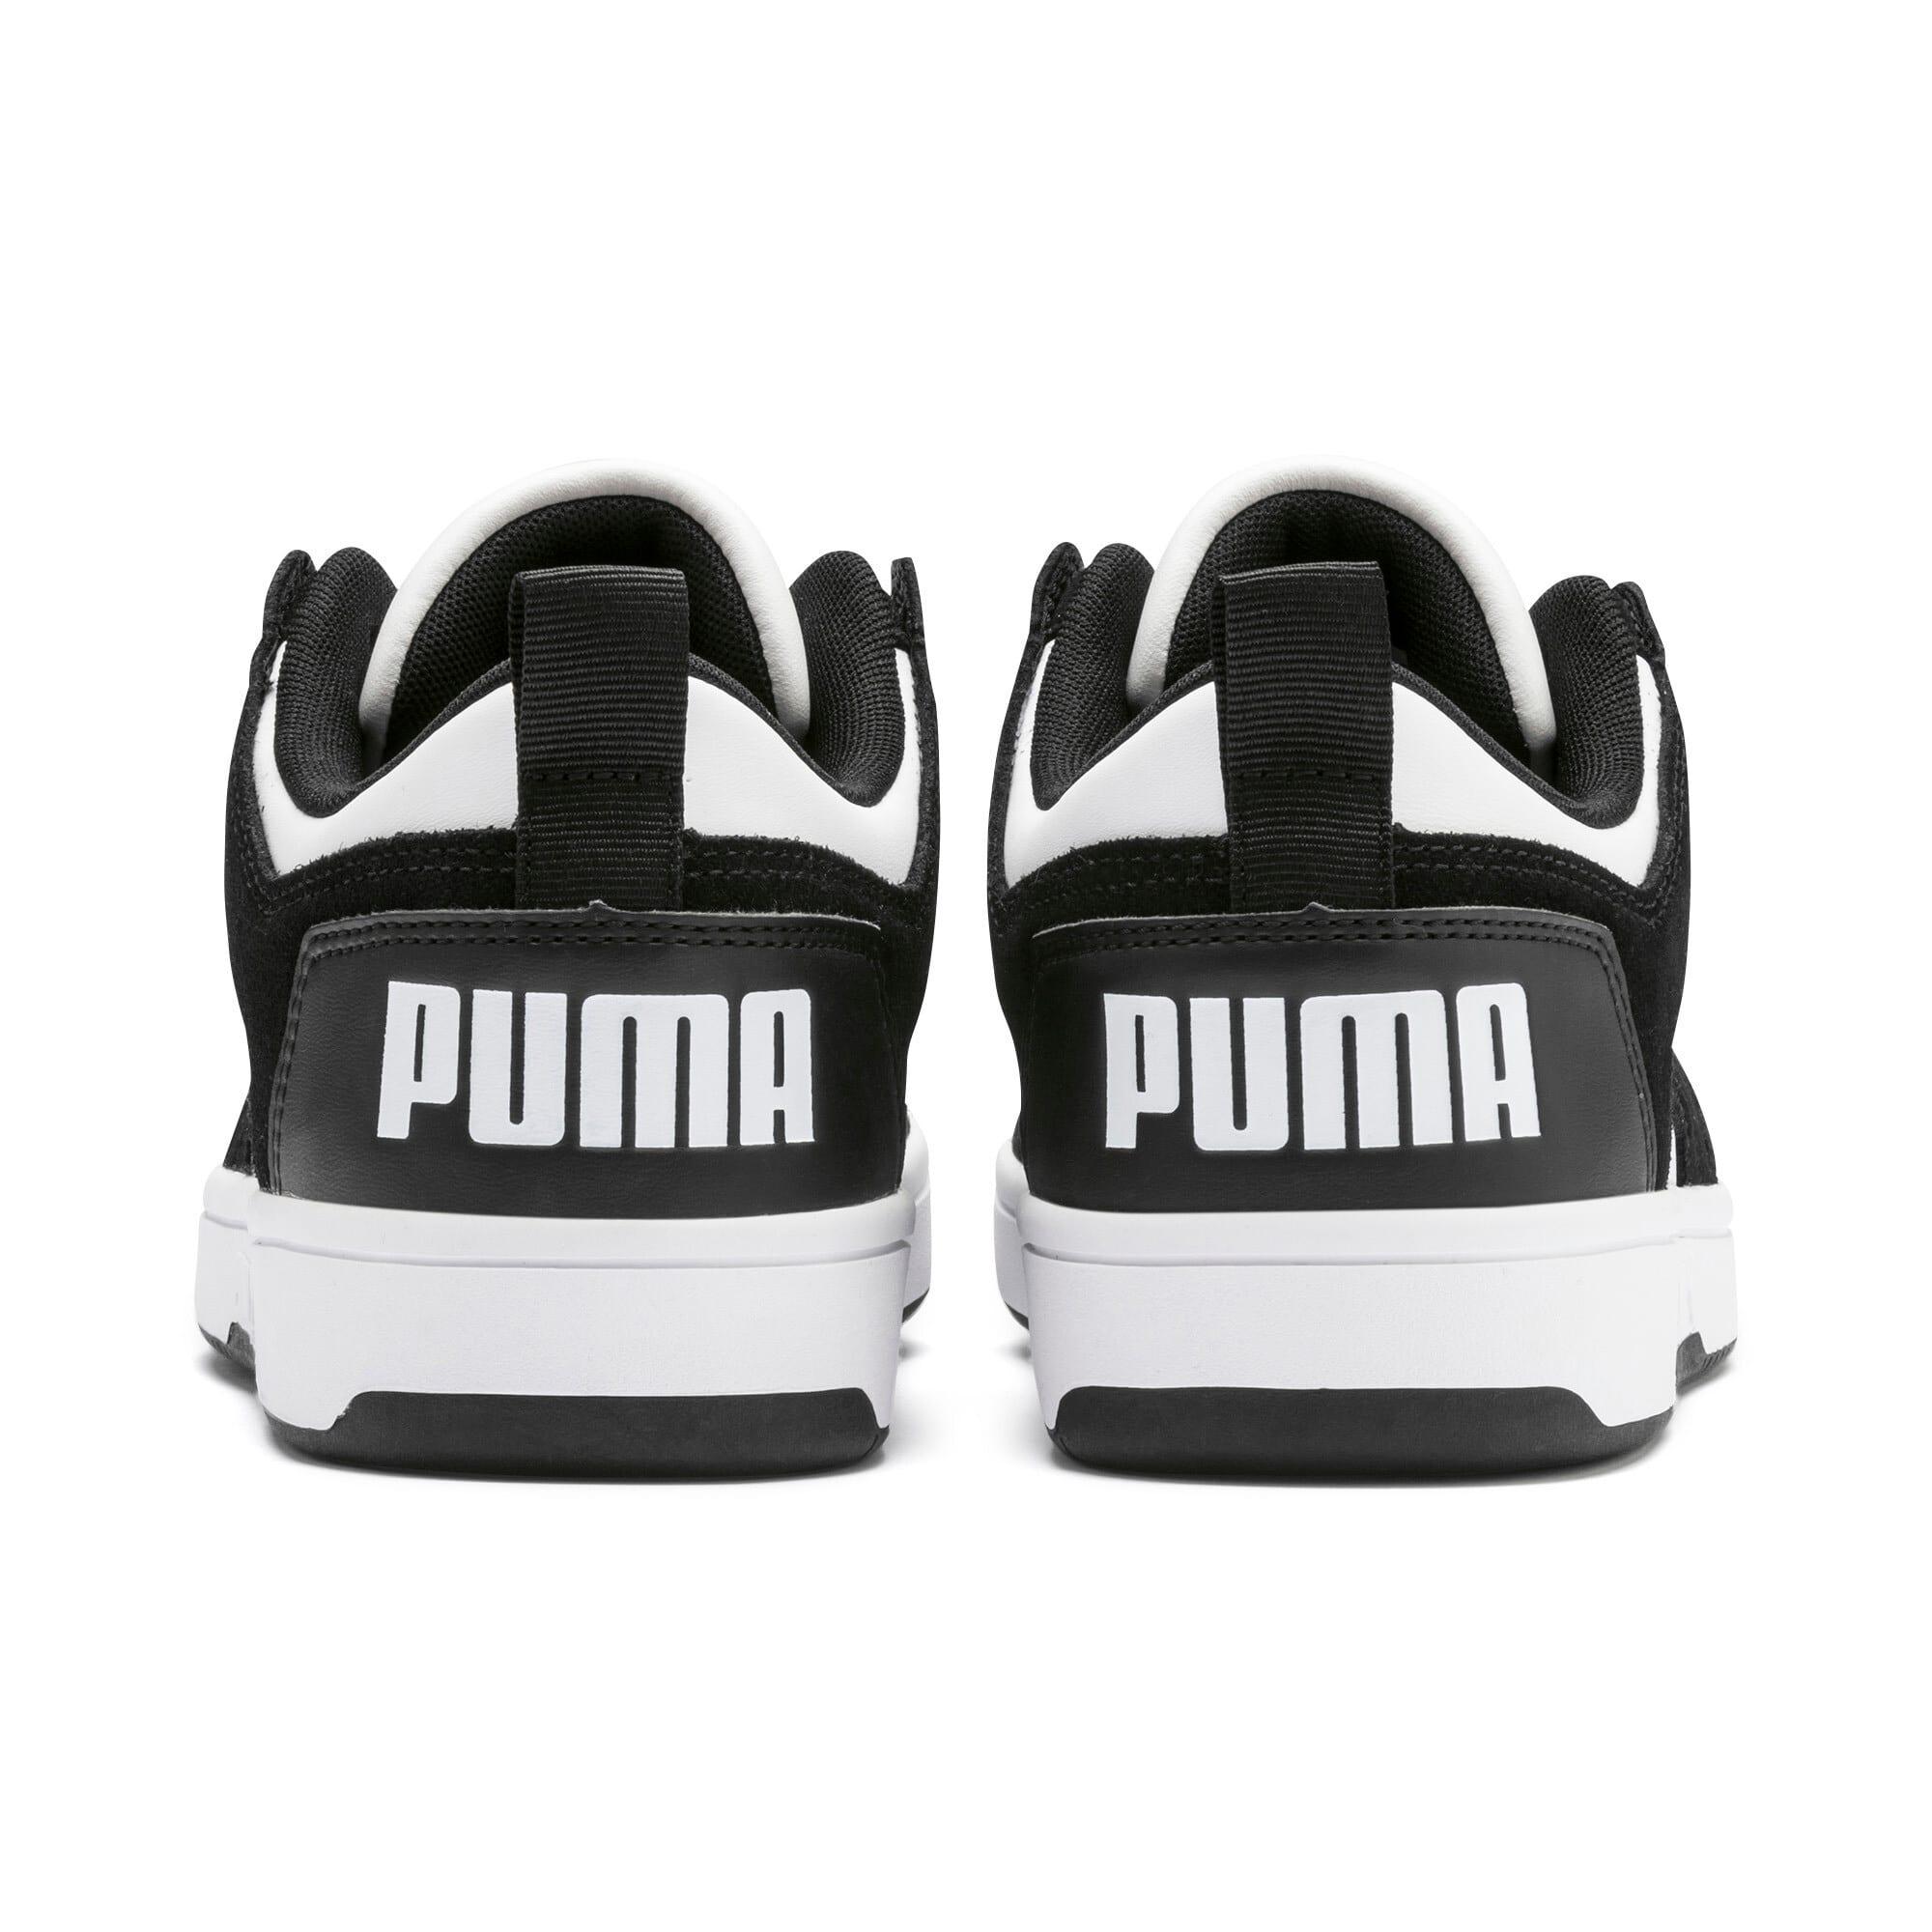 Miniatura 4 de Zapatos deportivos de gamuza PUMA Rebound LayUpLo, Puma Black-Puma White, mediano